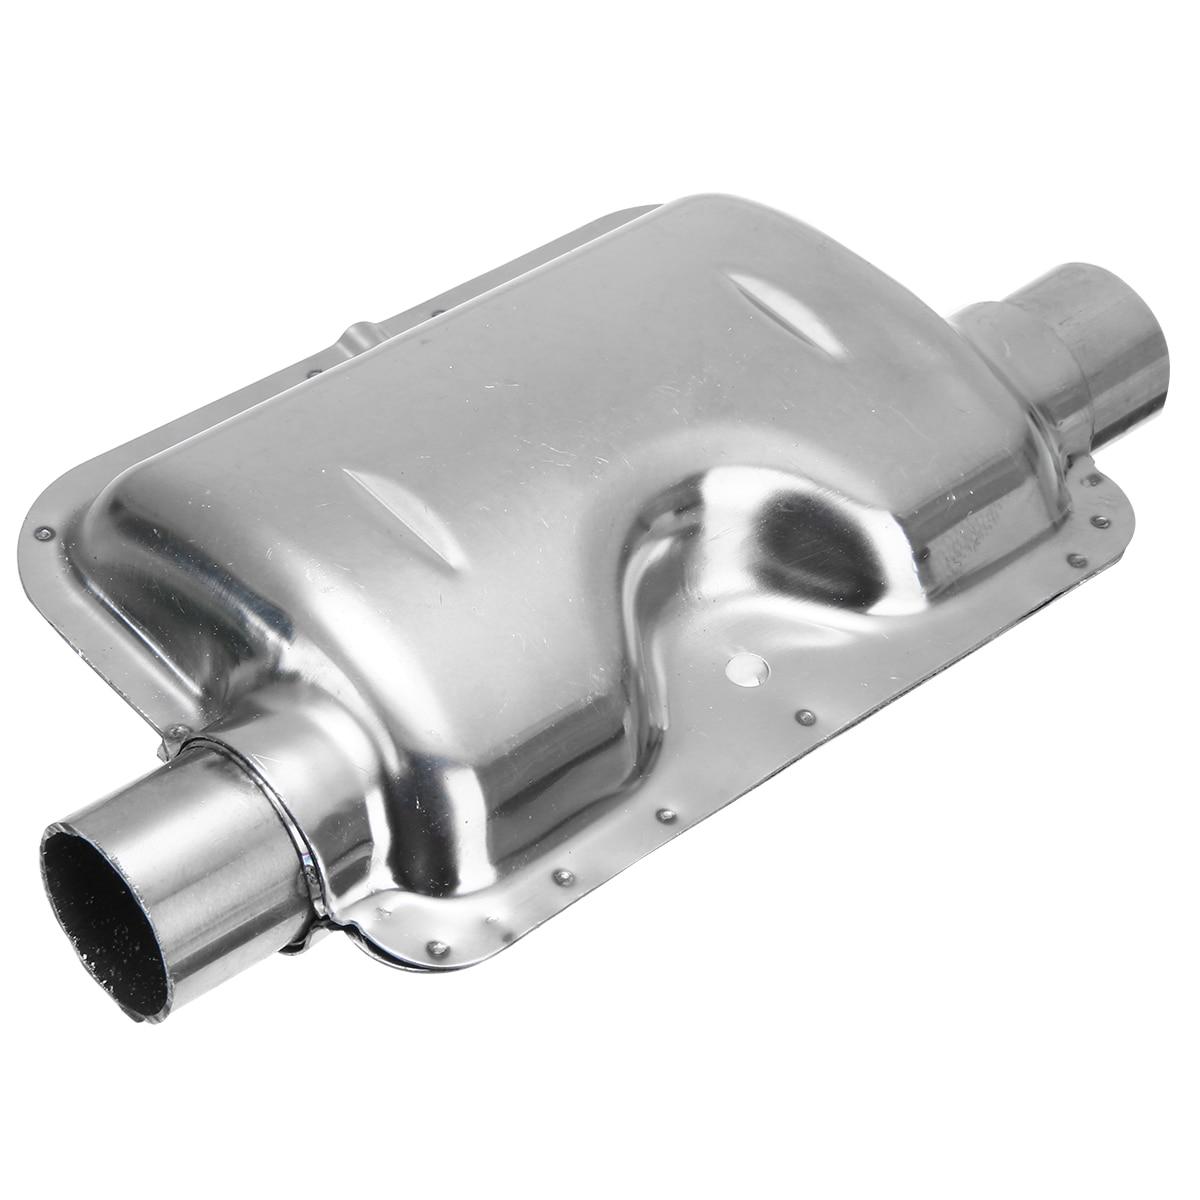 24mm Stainless Steel Exhaust Silencer Muffler For Air Diesel Car Parking Heater